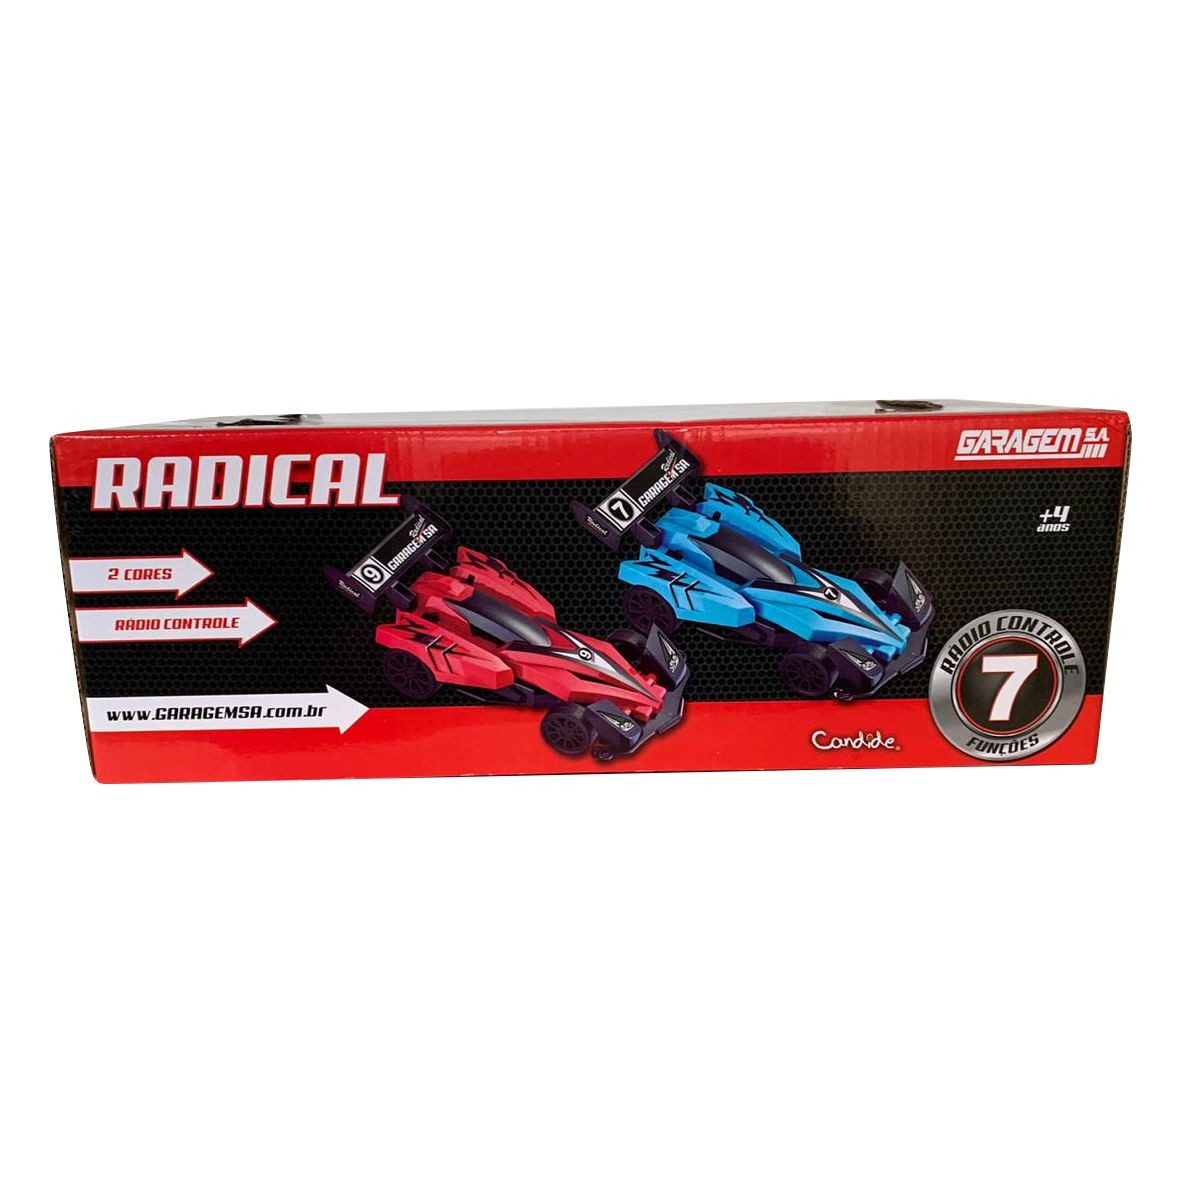 Veículo Radical Controler